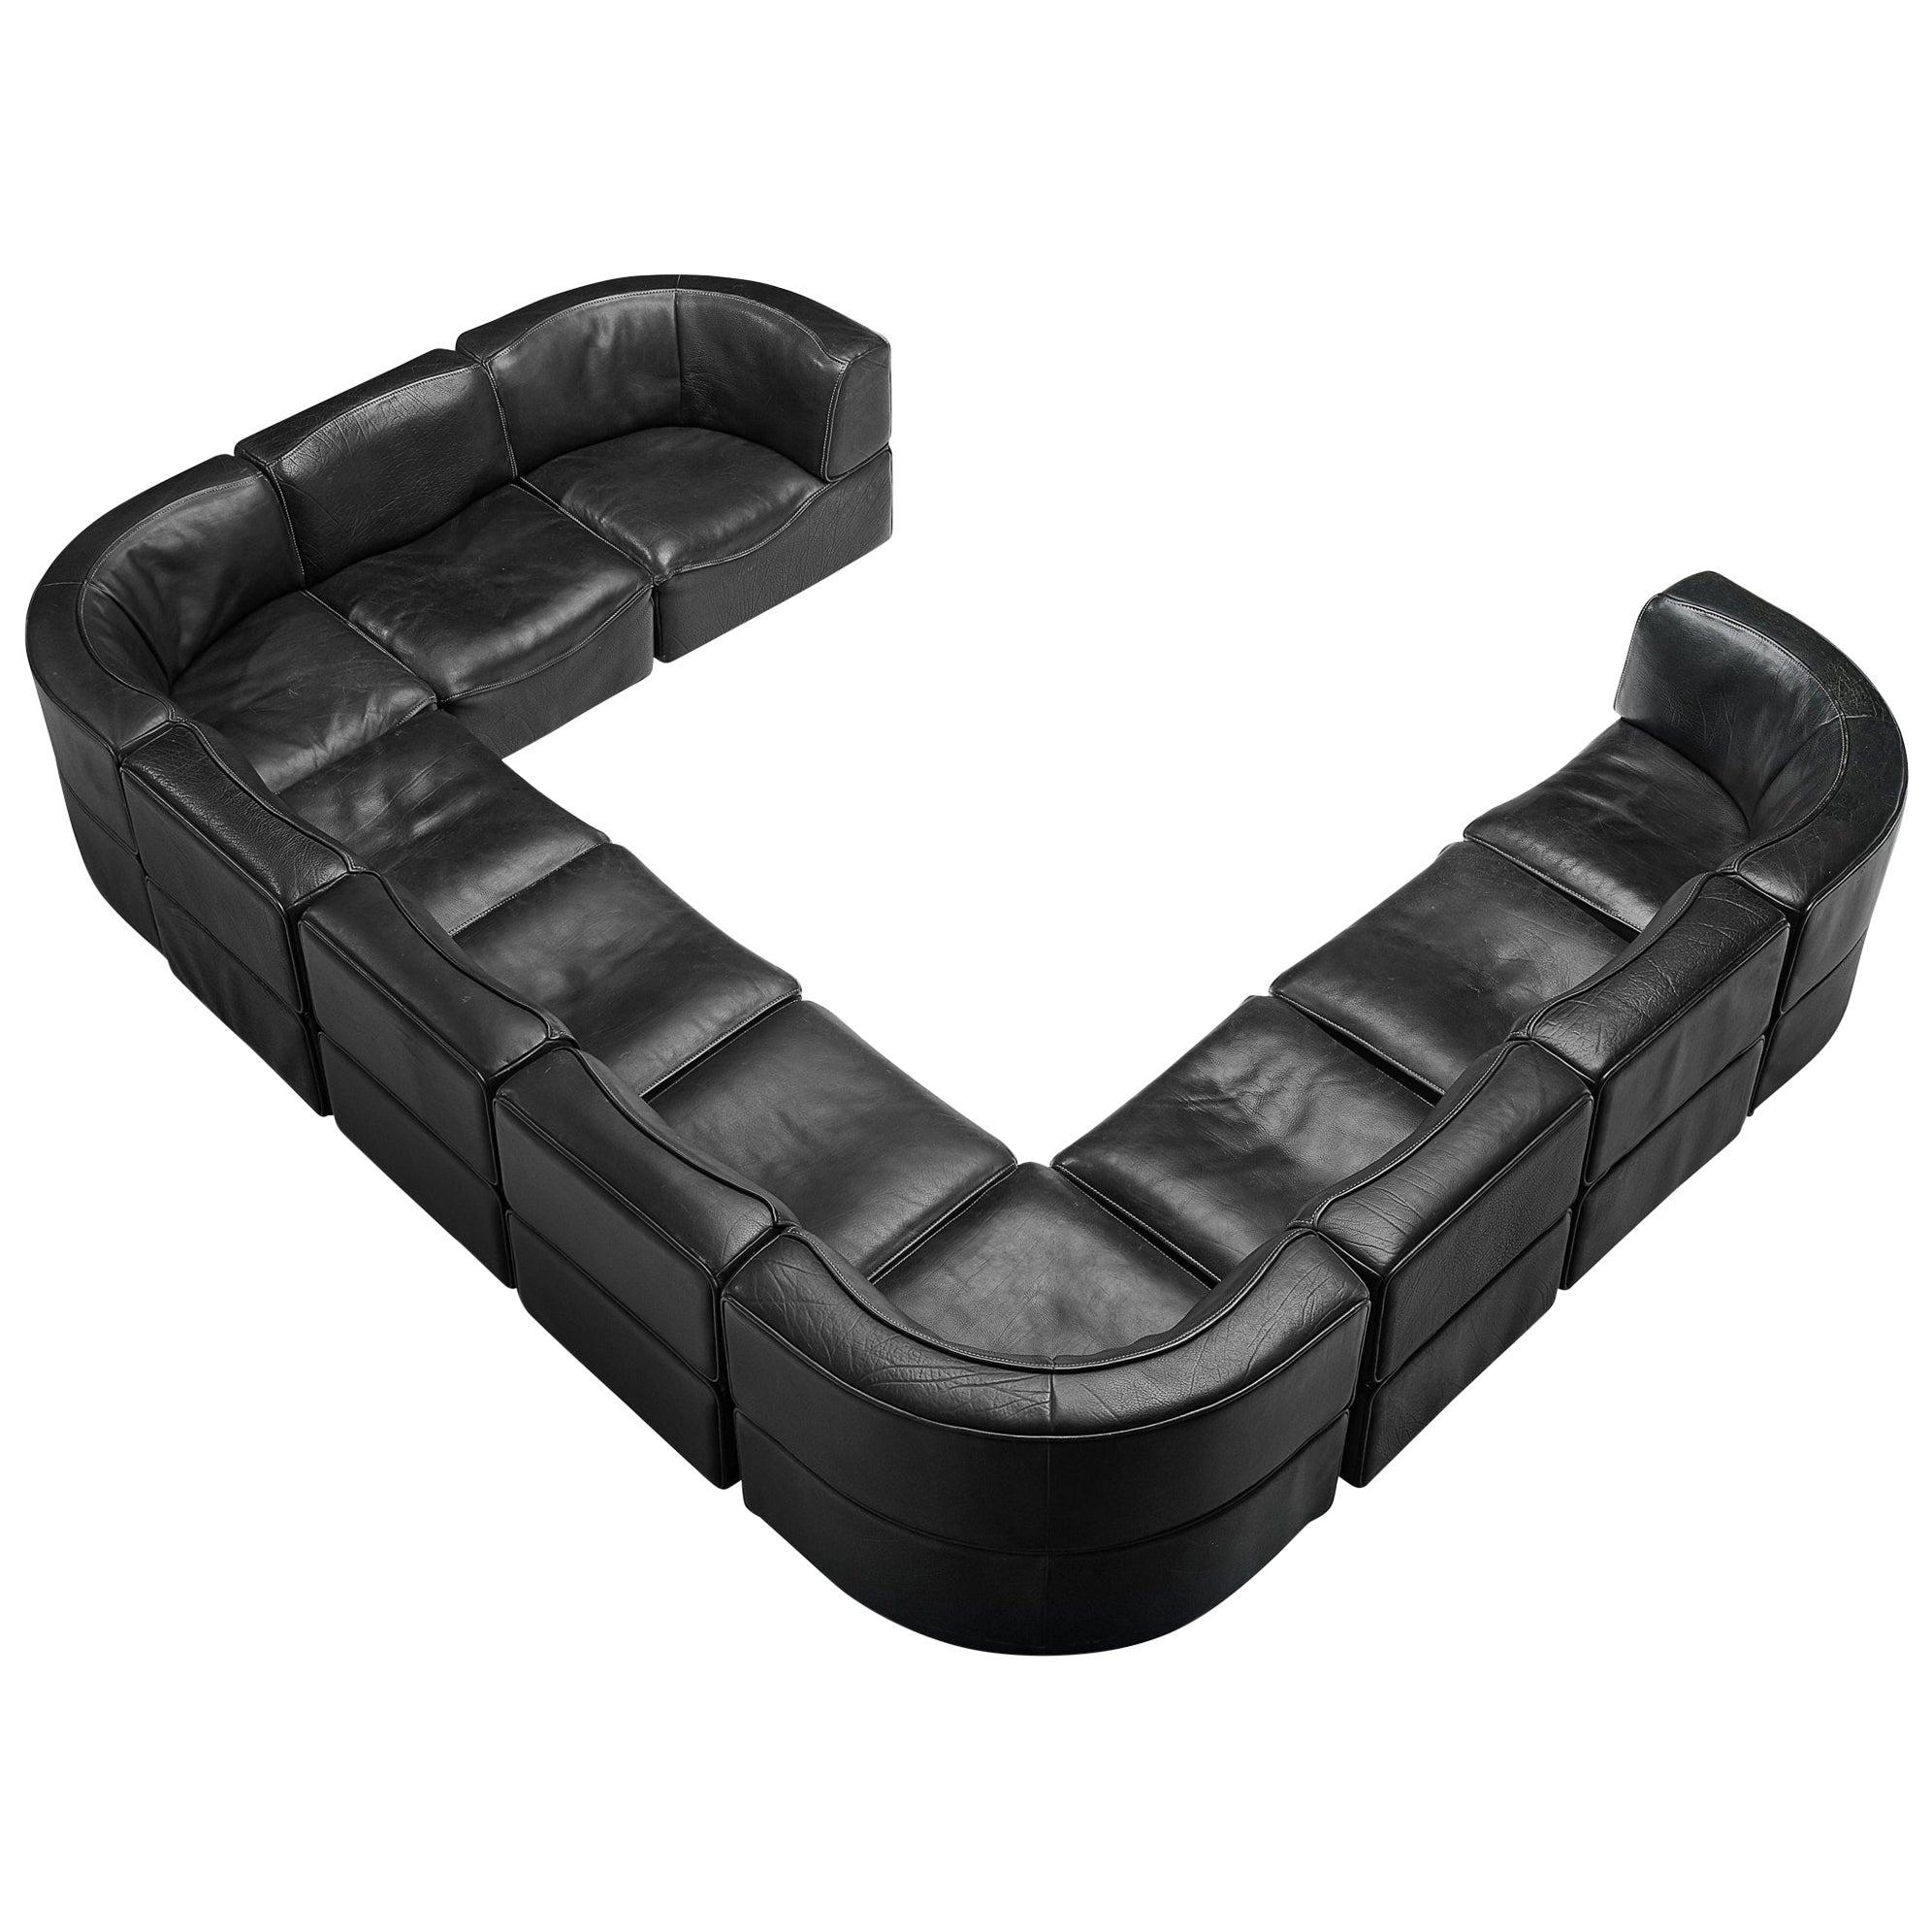 De Sede 'DS-15' Modular Sofa in Black Leather